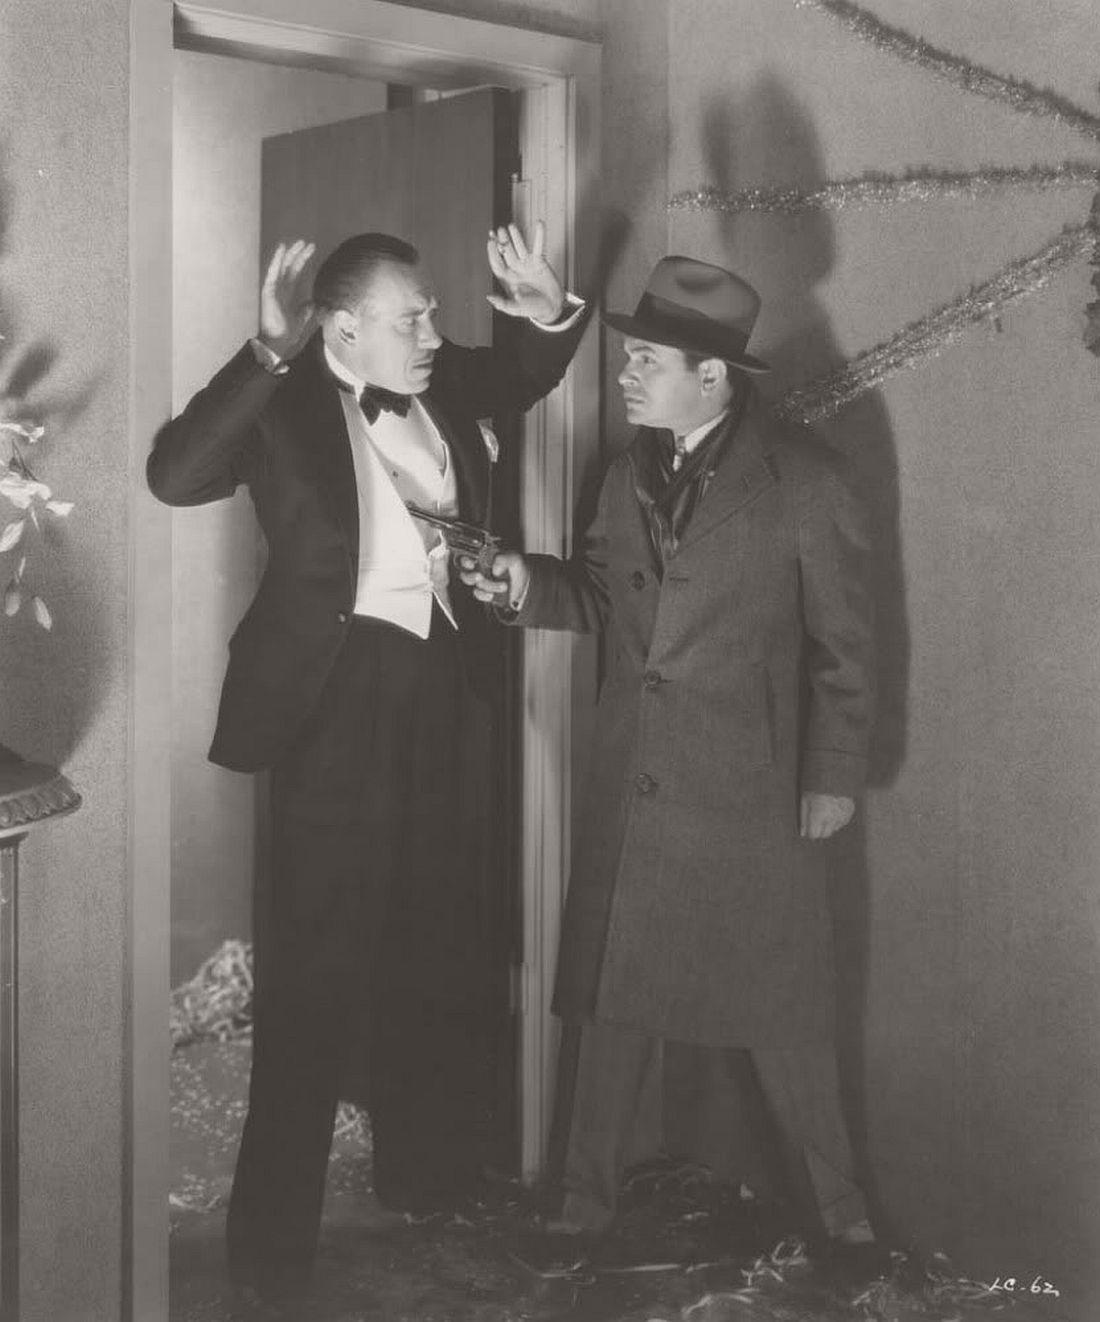 ttle-caesar-1931-behind-the-scenes-making-film-06